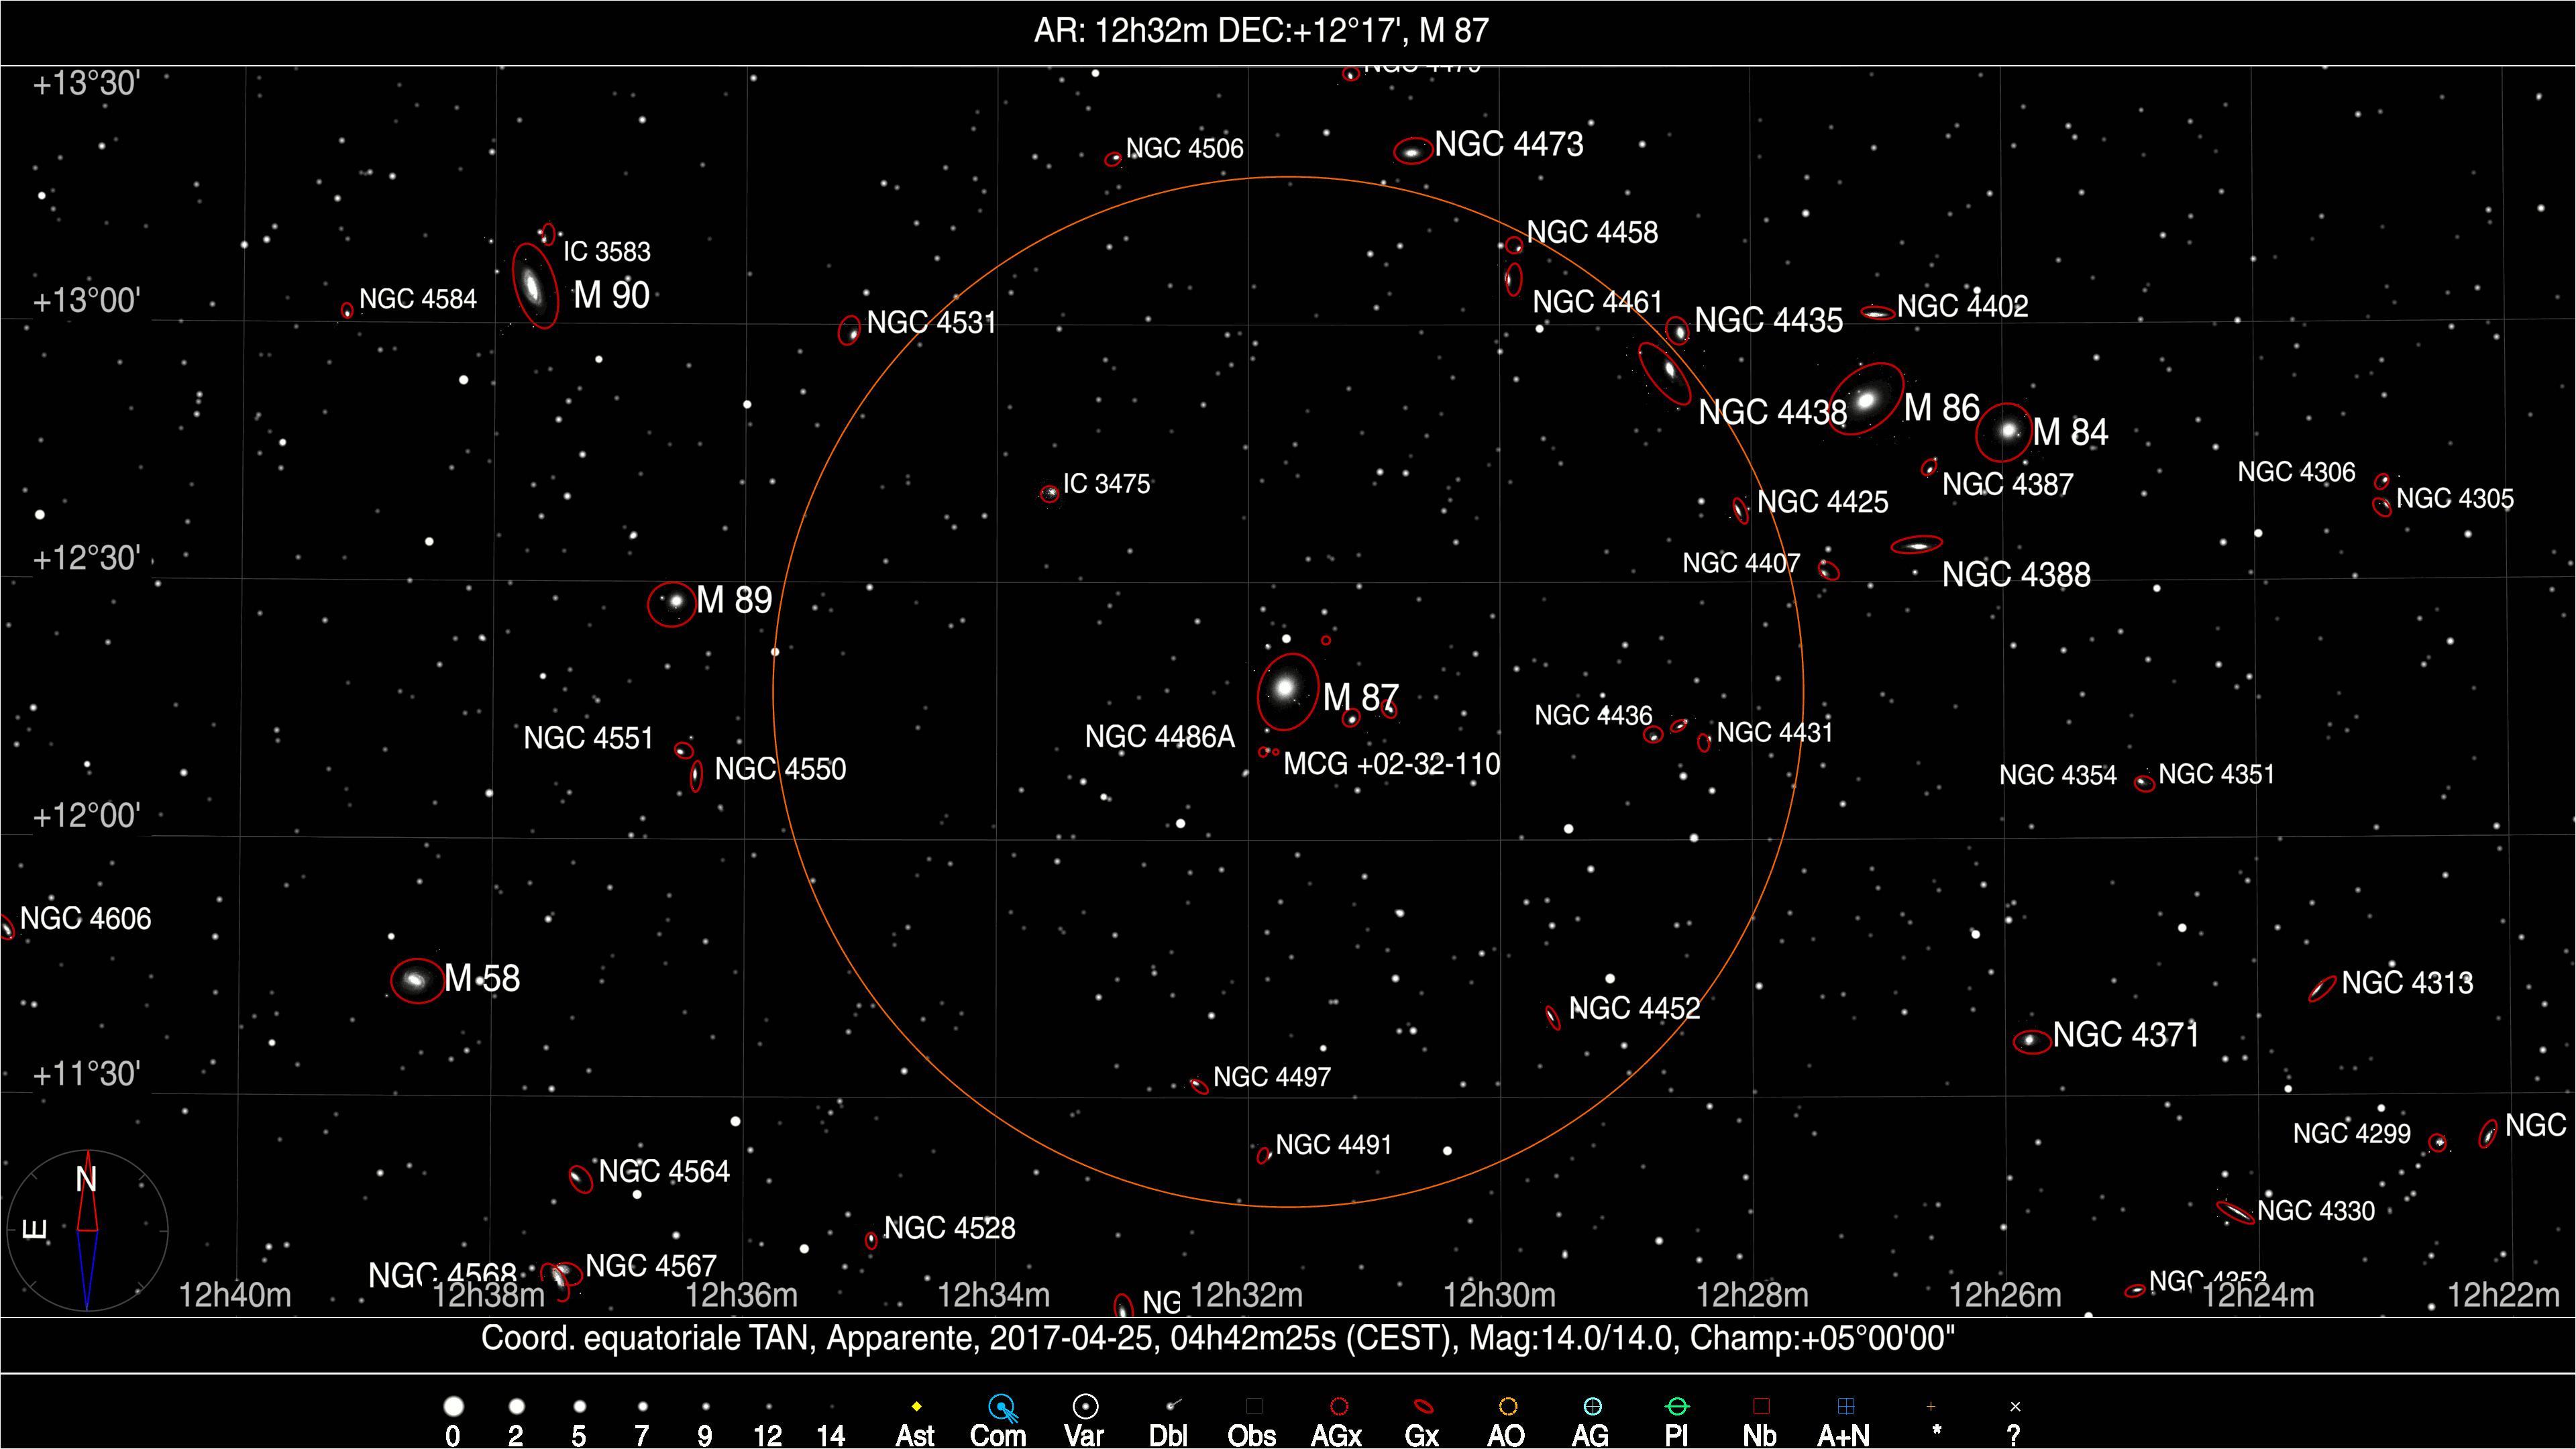 M87_5